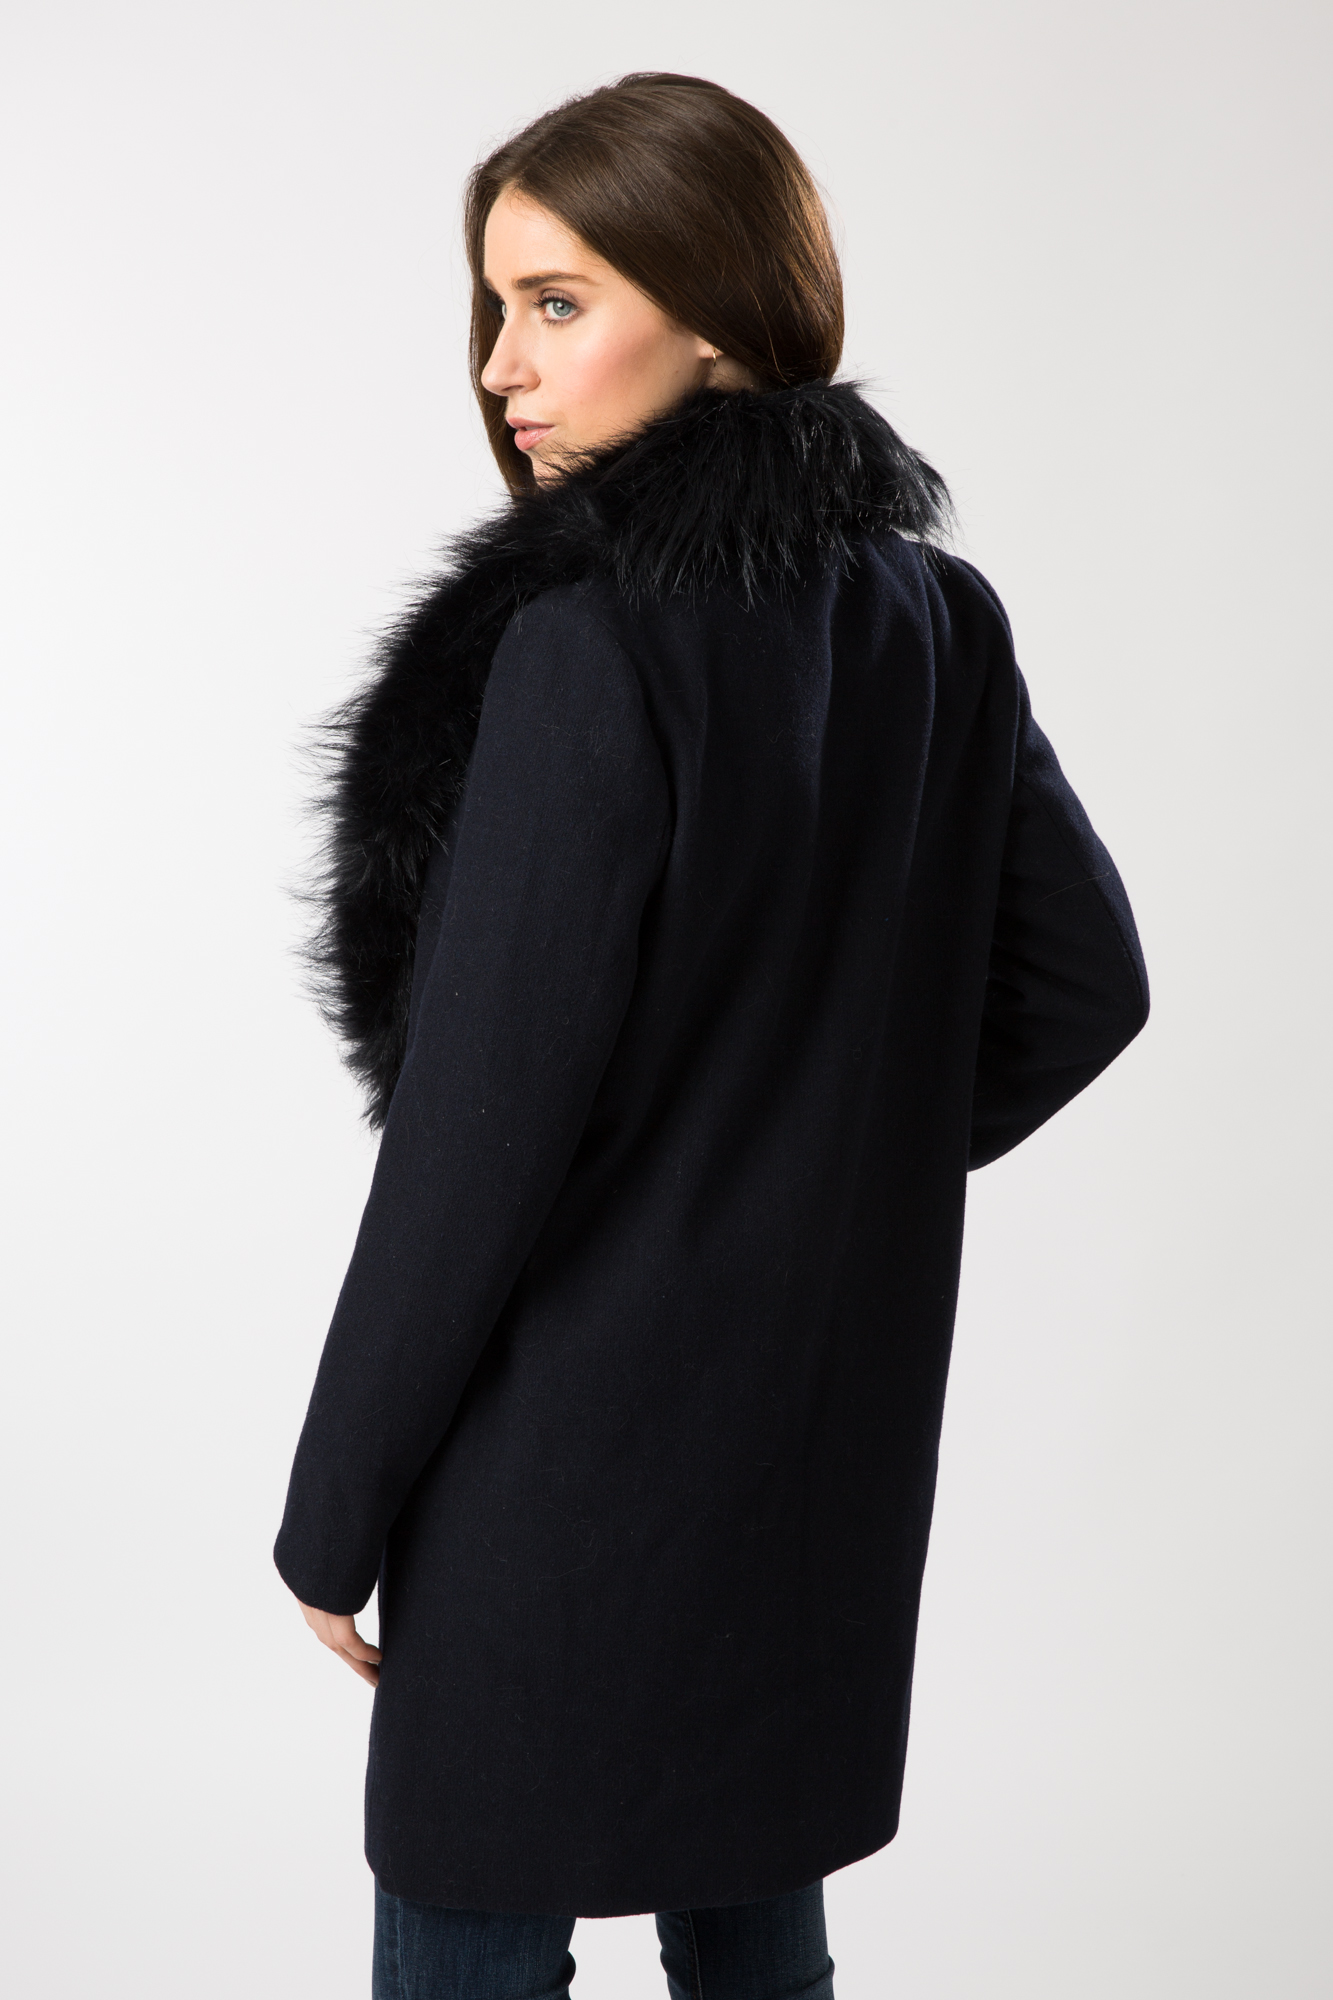 Smart black coat with fur collar